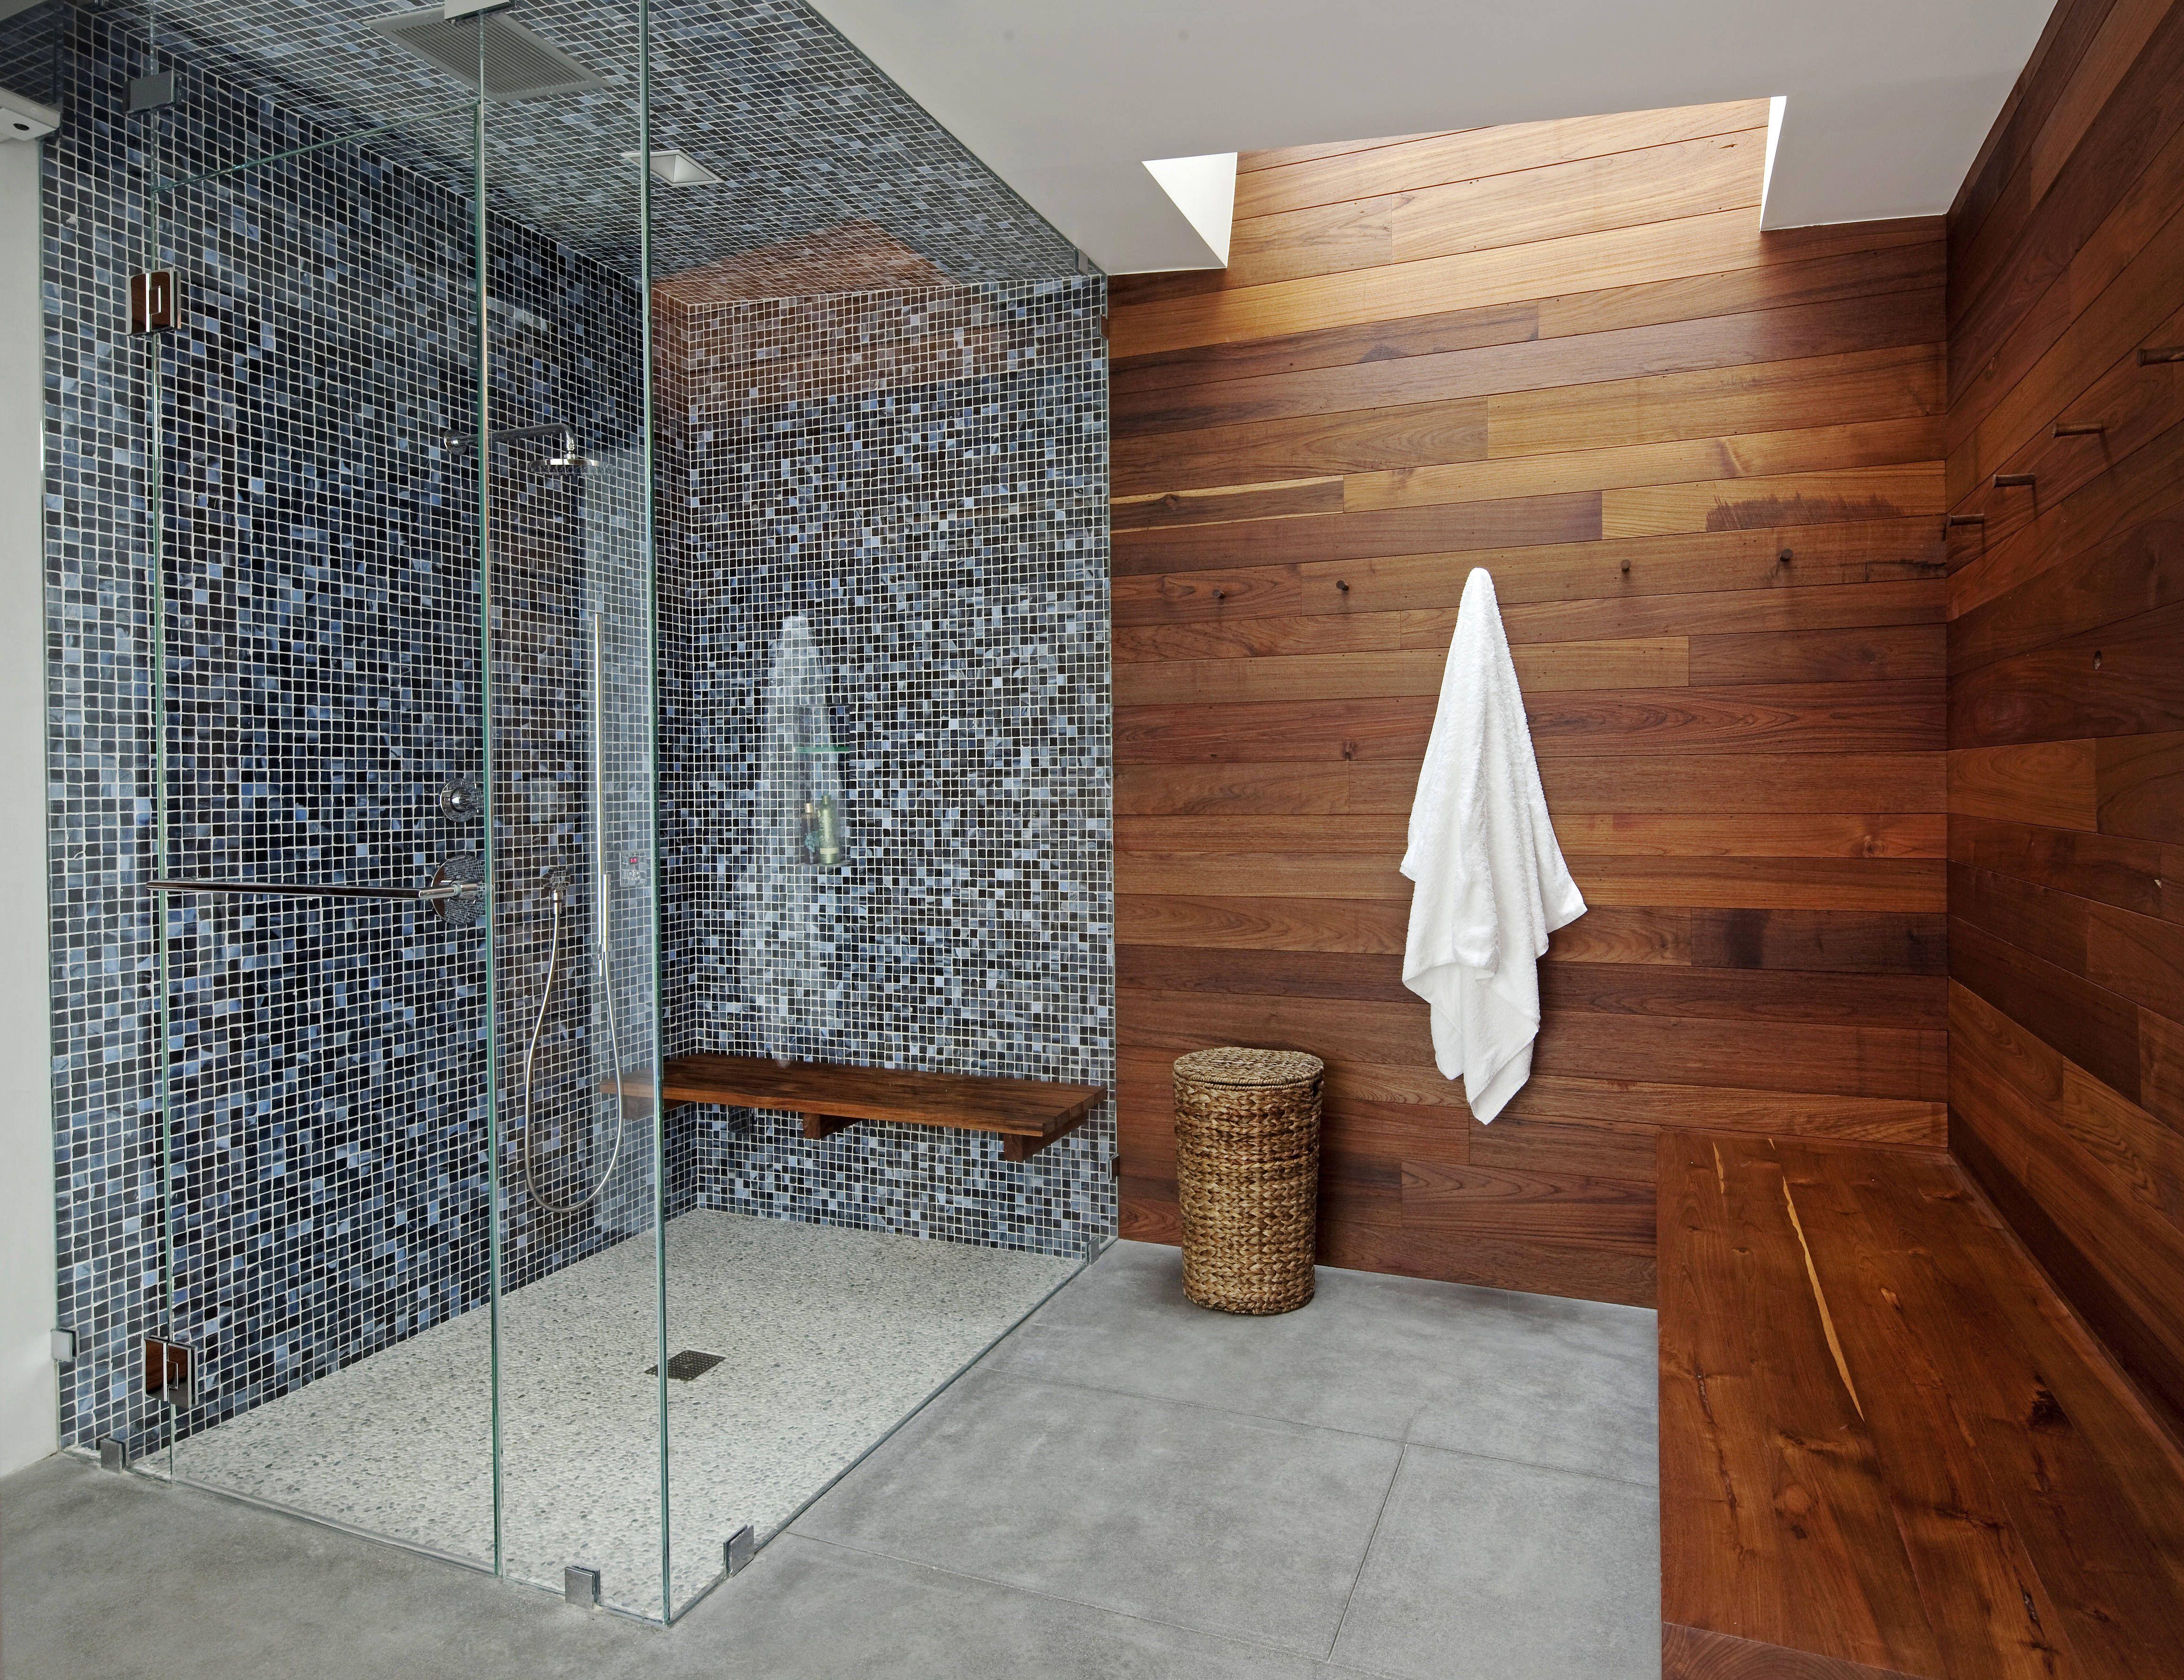 Katie Leede and Company Pool house shower. Basement